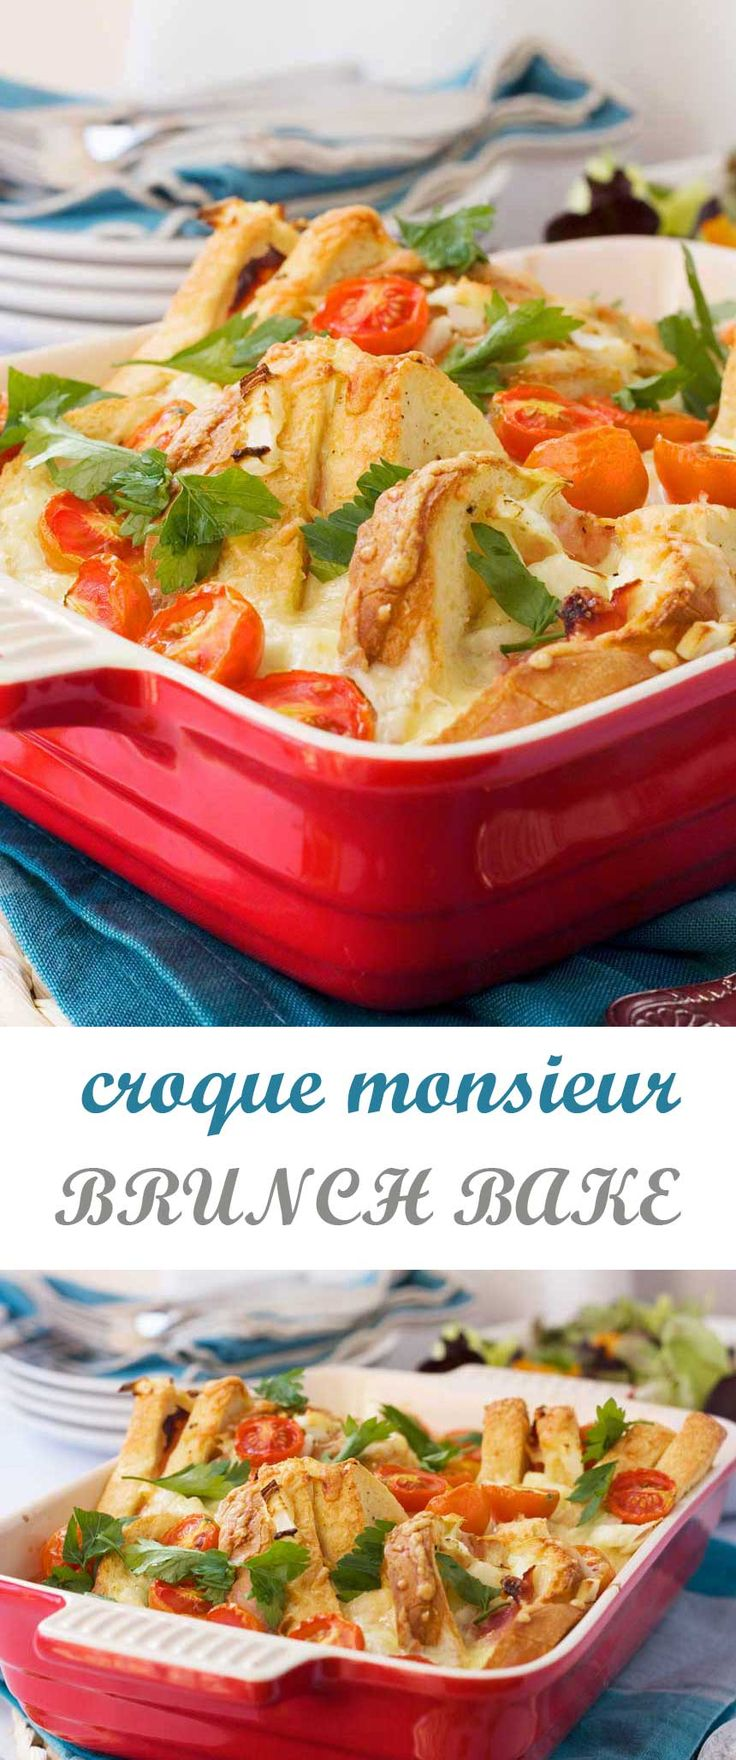 Croque monsieur brunch bake